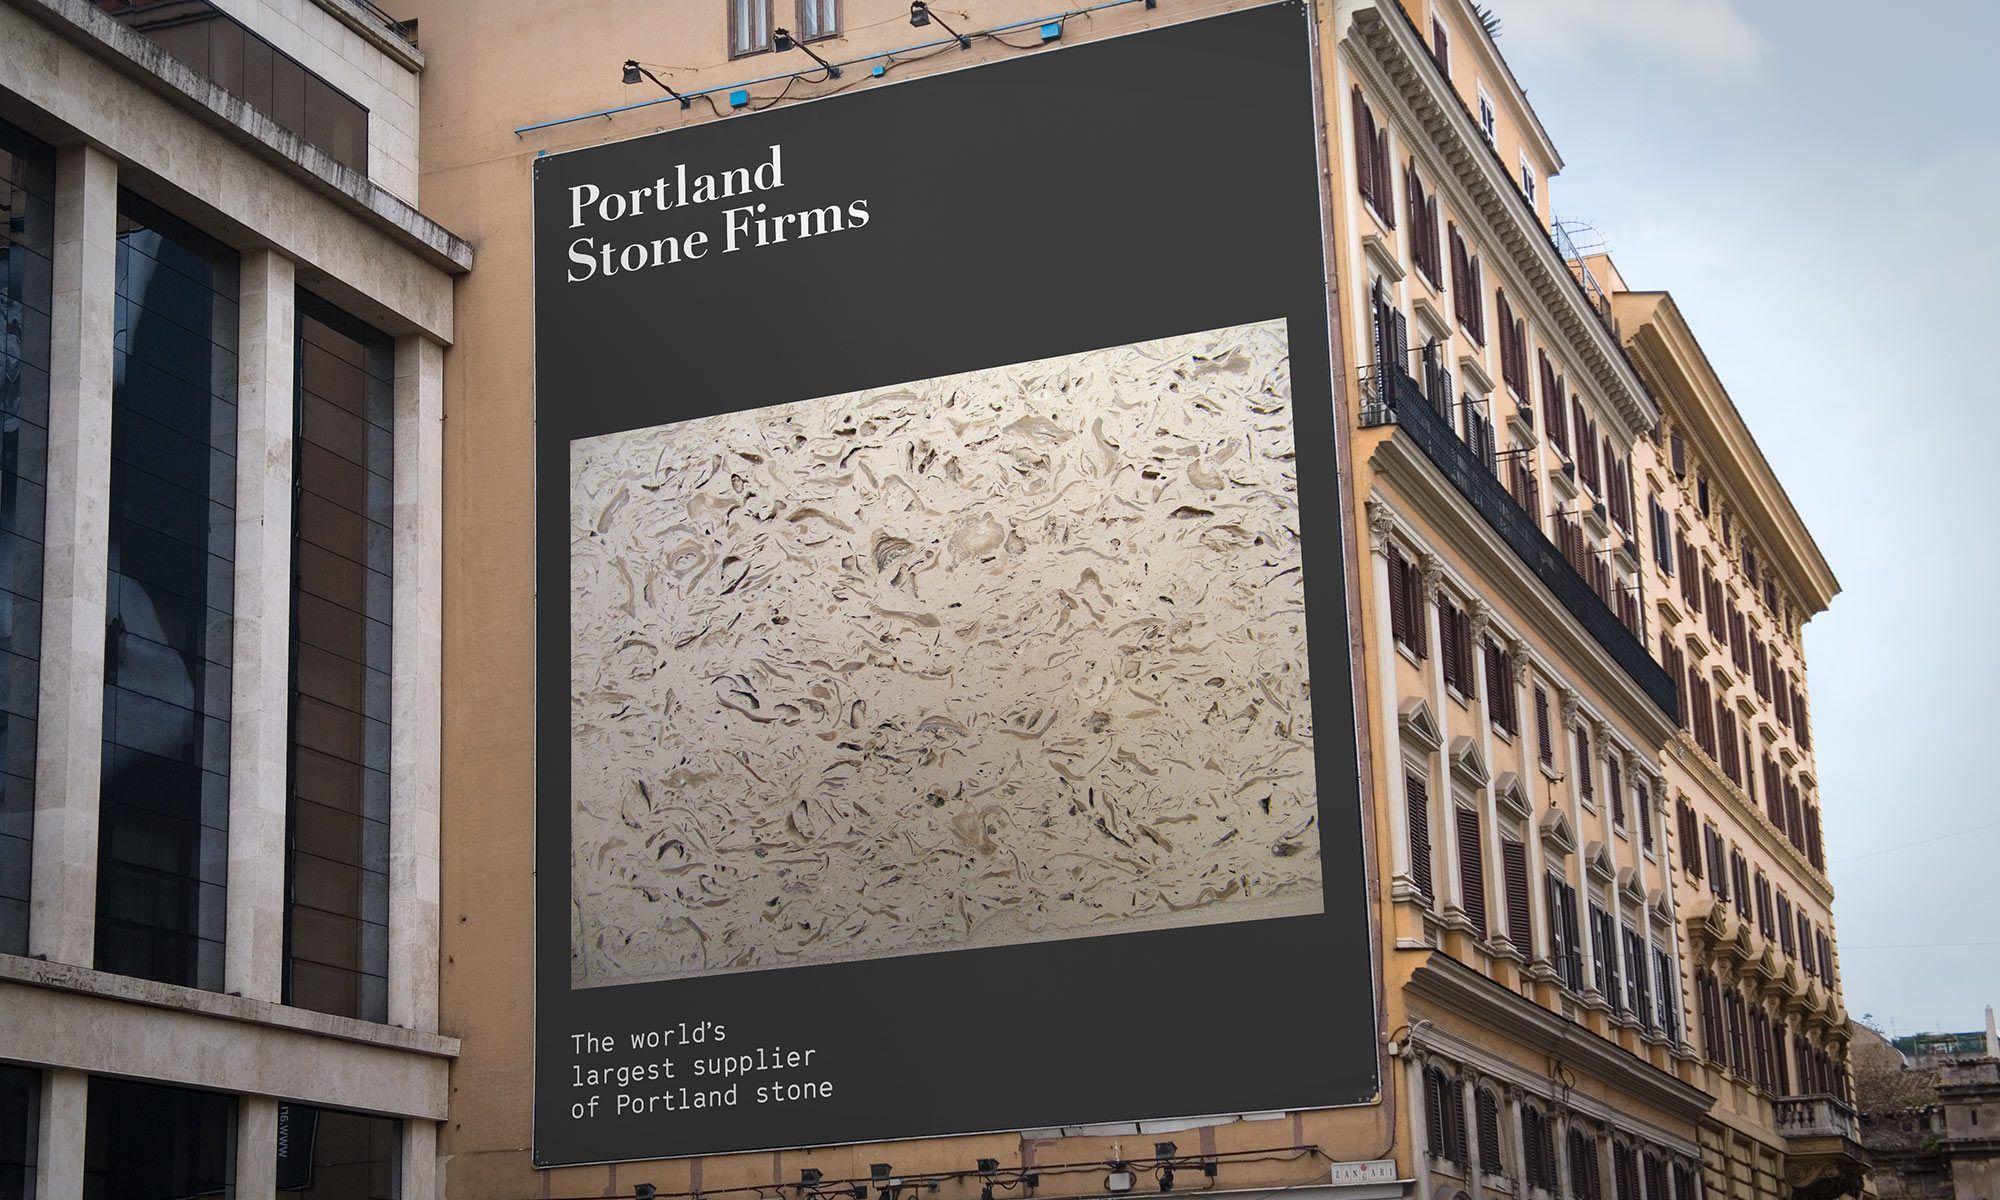 portland stone firms